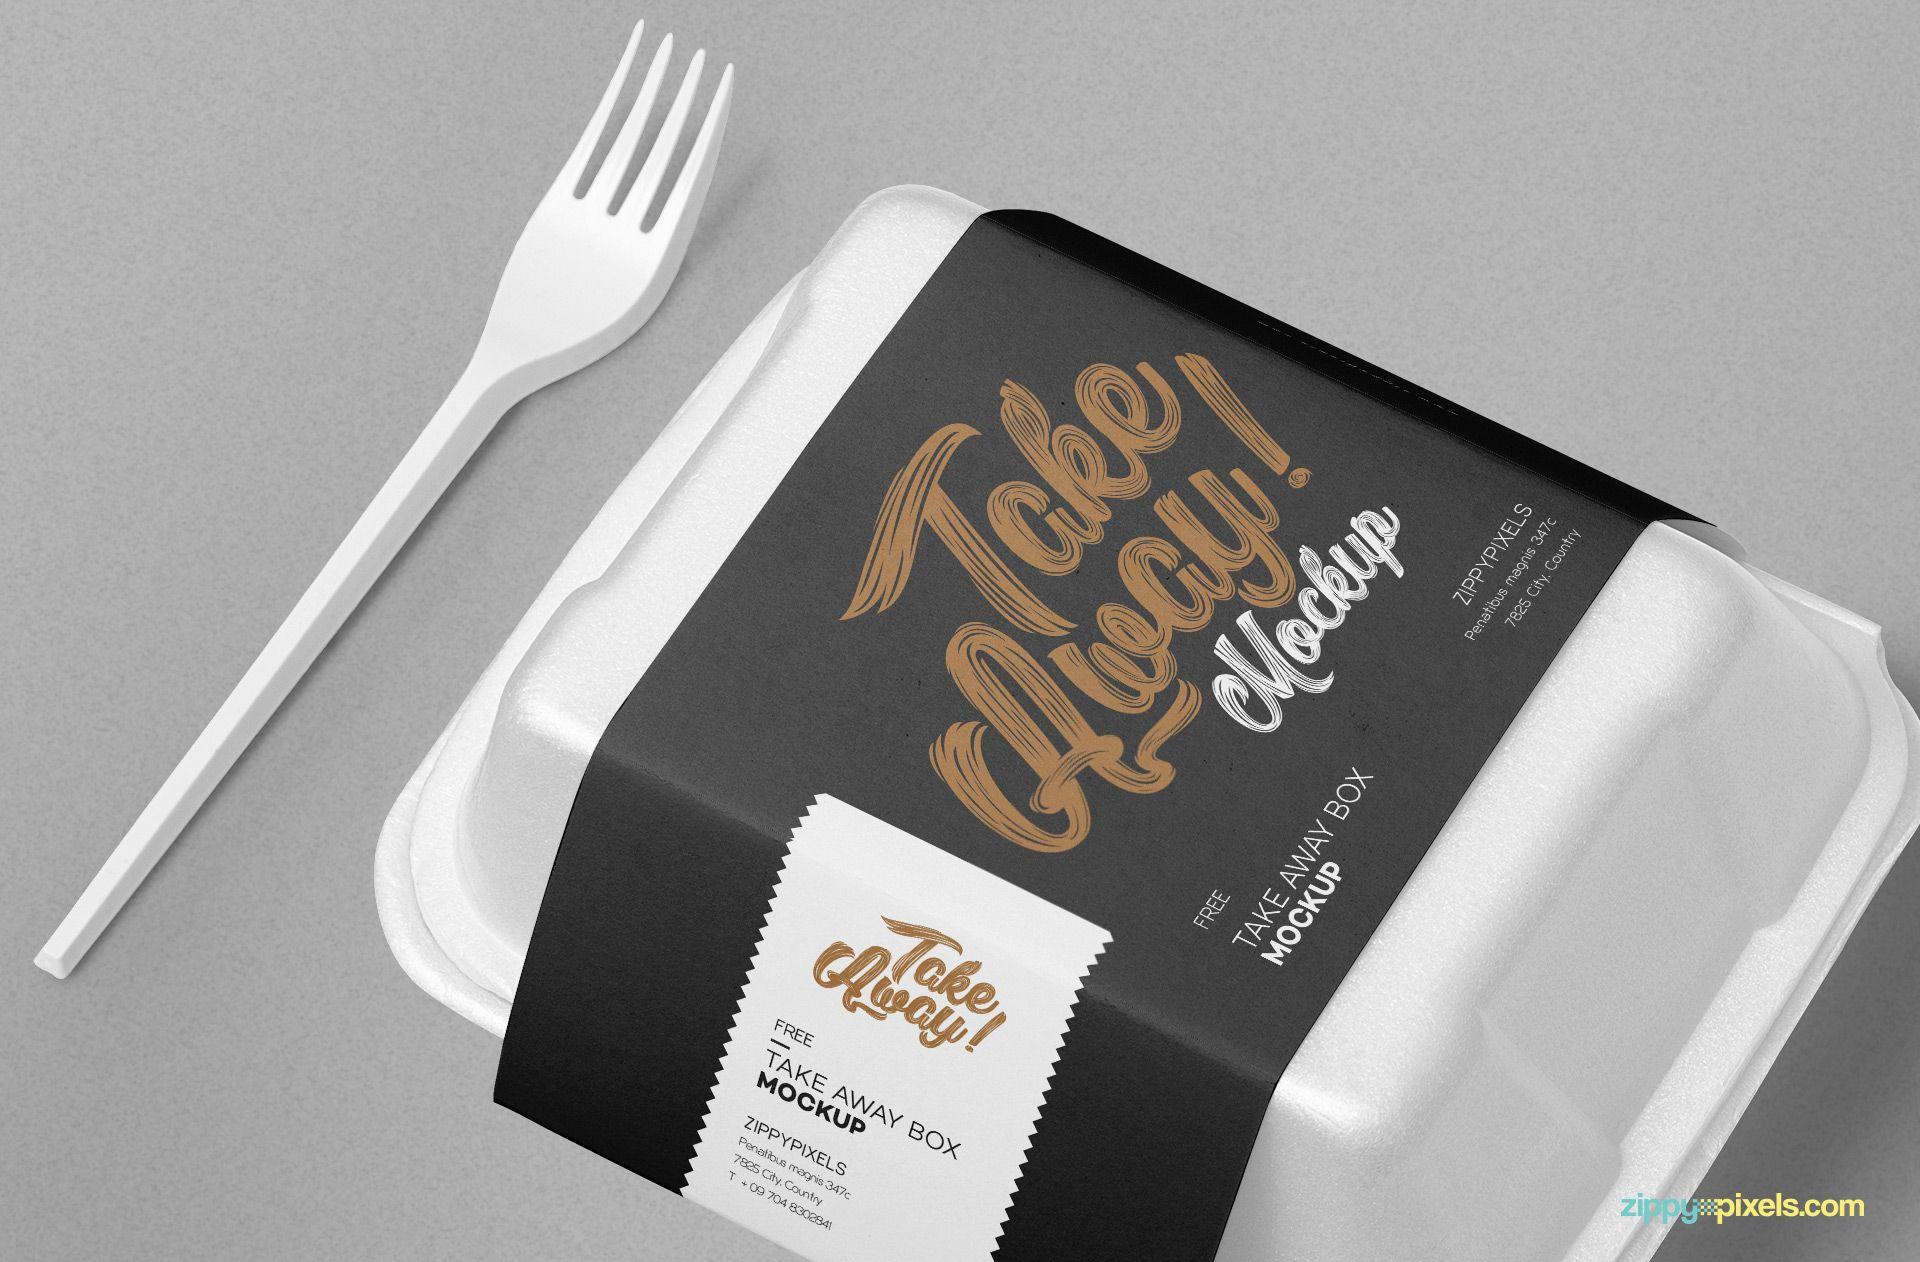 Download Free Disposable Food Packaging Mockup Zippypixels Food Packaging Packaging Mockup Bakery Packaging